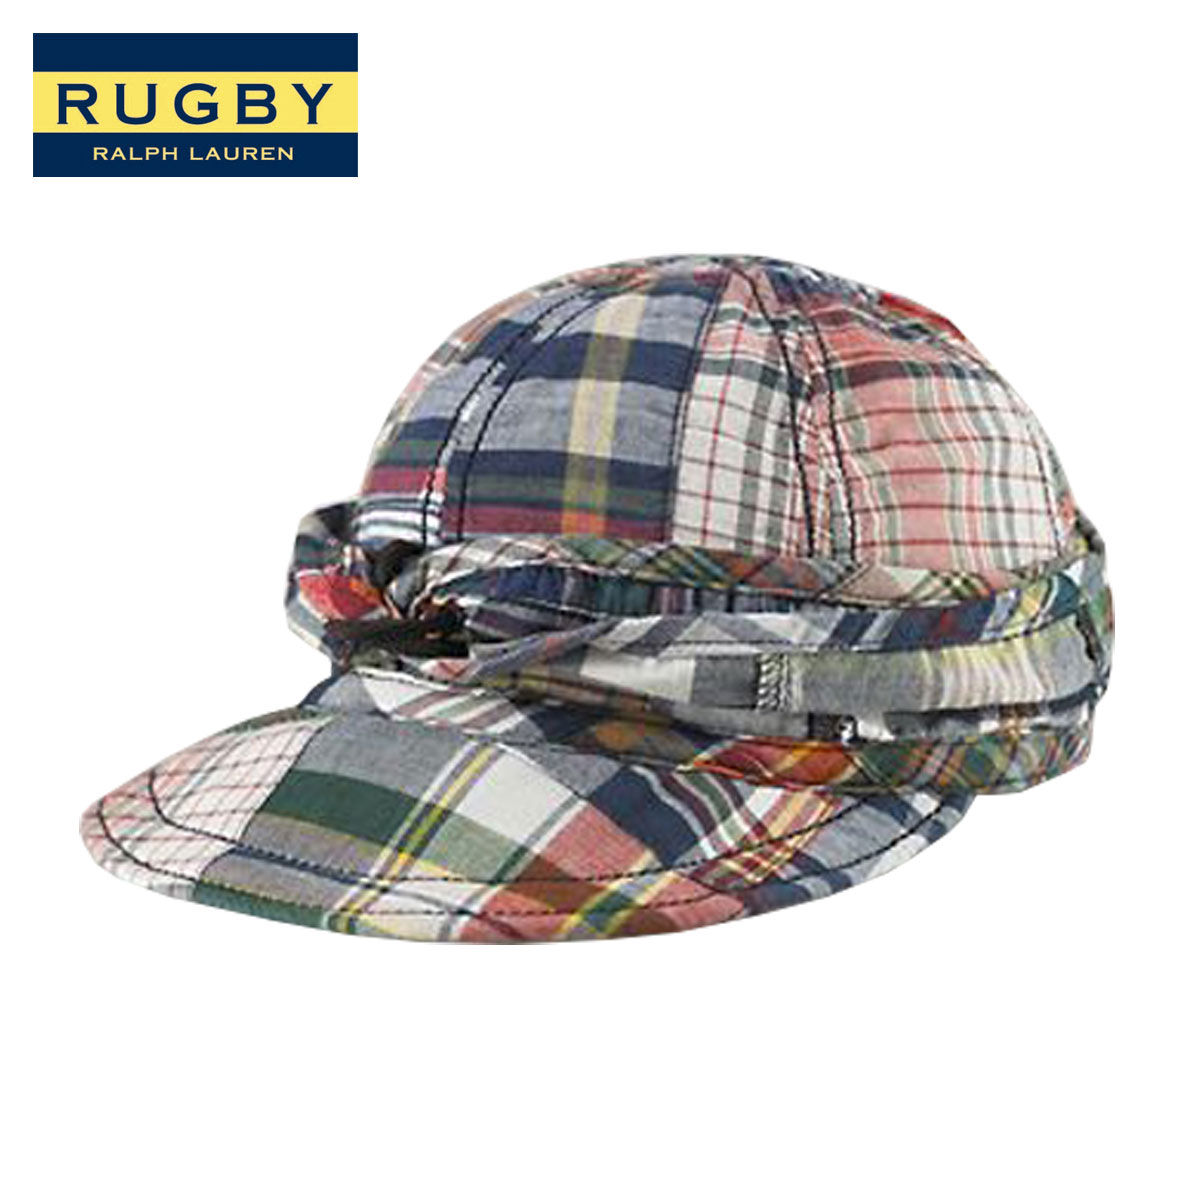 Rakuten Ichiba shop MIXON  Ralph Lauren Rugby RUGBY RALPH LAUREN genuine  Hat Cap Madras Utility Cap 10P24Oct15  2e15240a4314